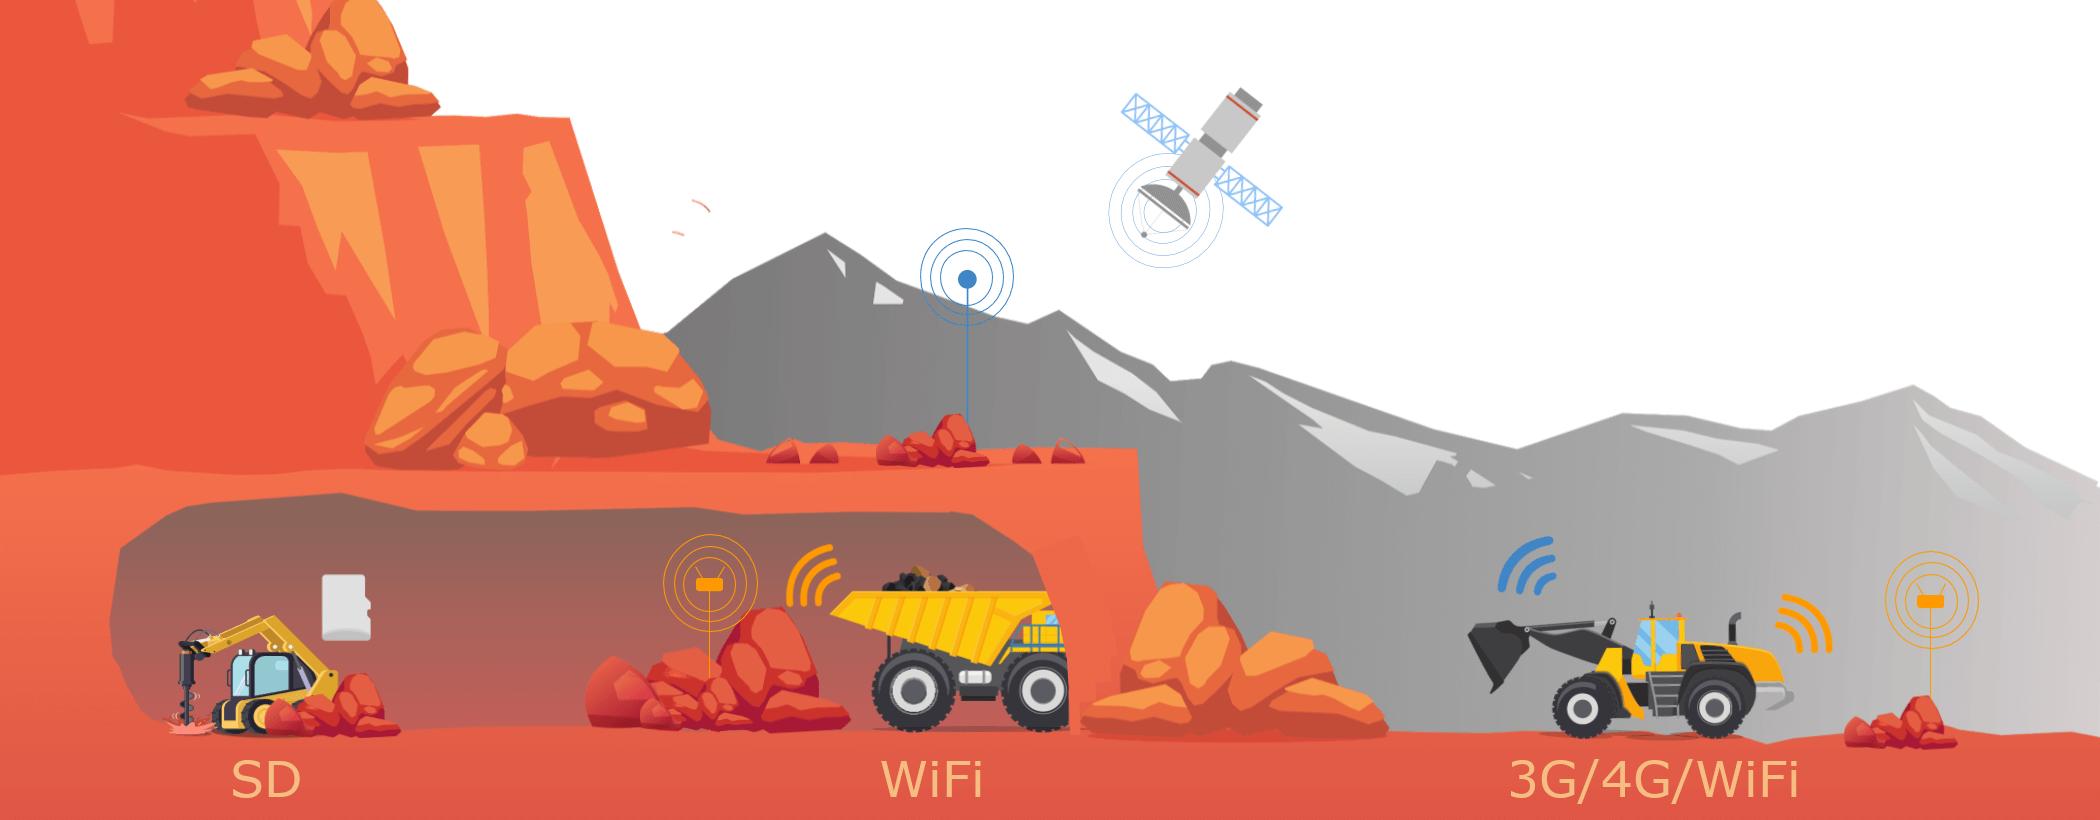 Mining Fleet Telematics WiFi Underground Commodities